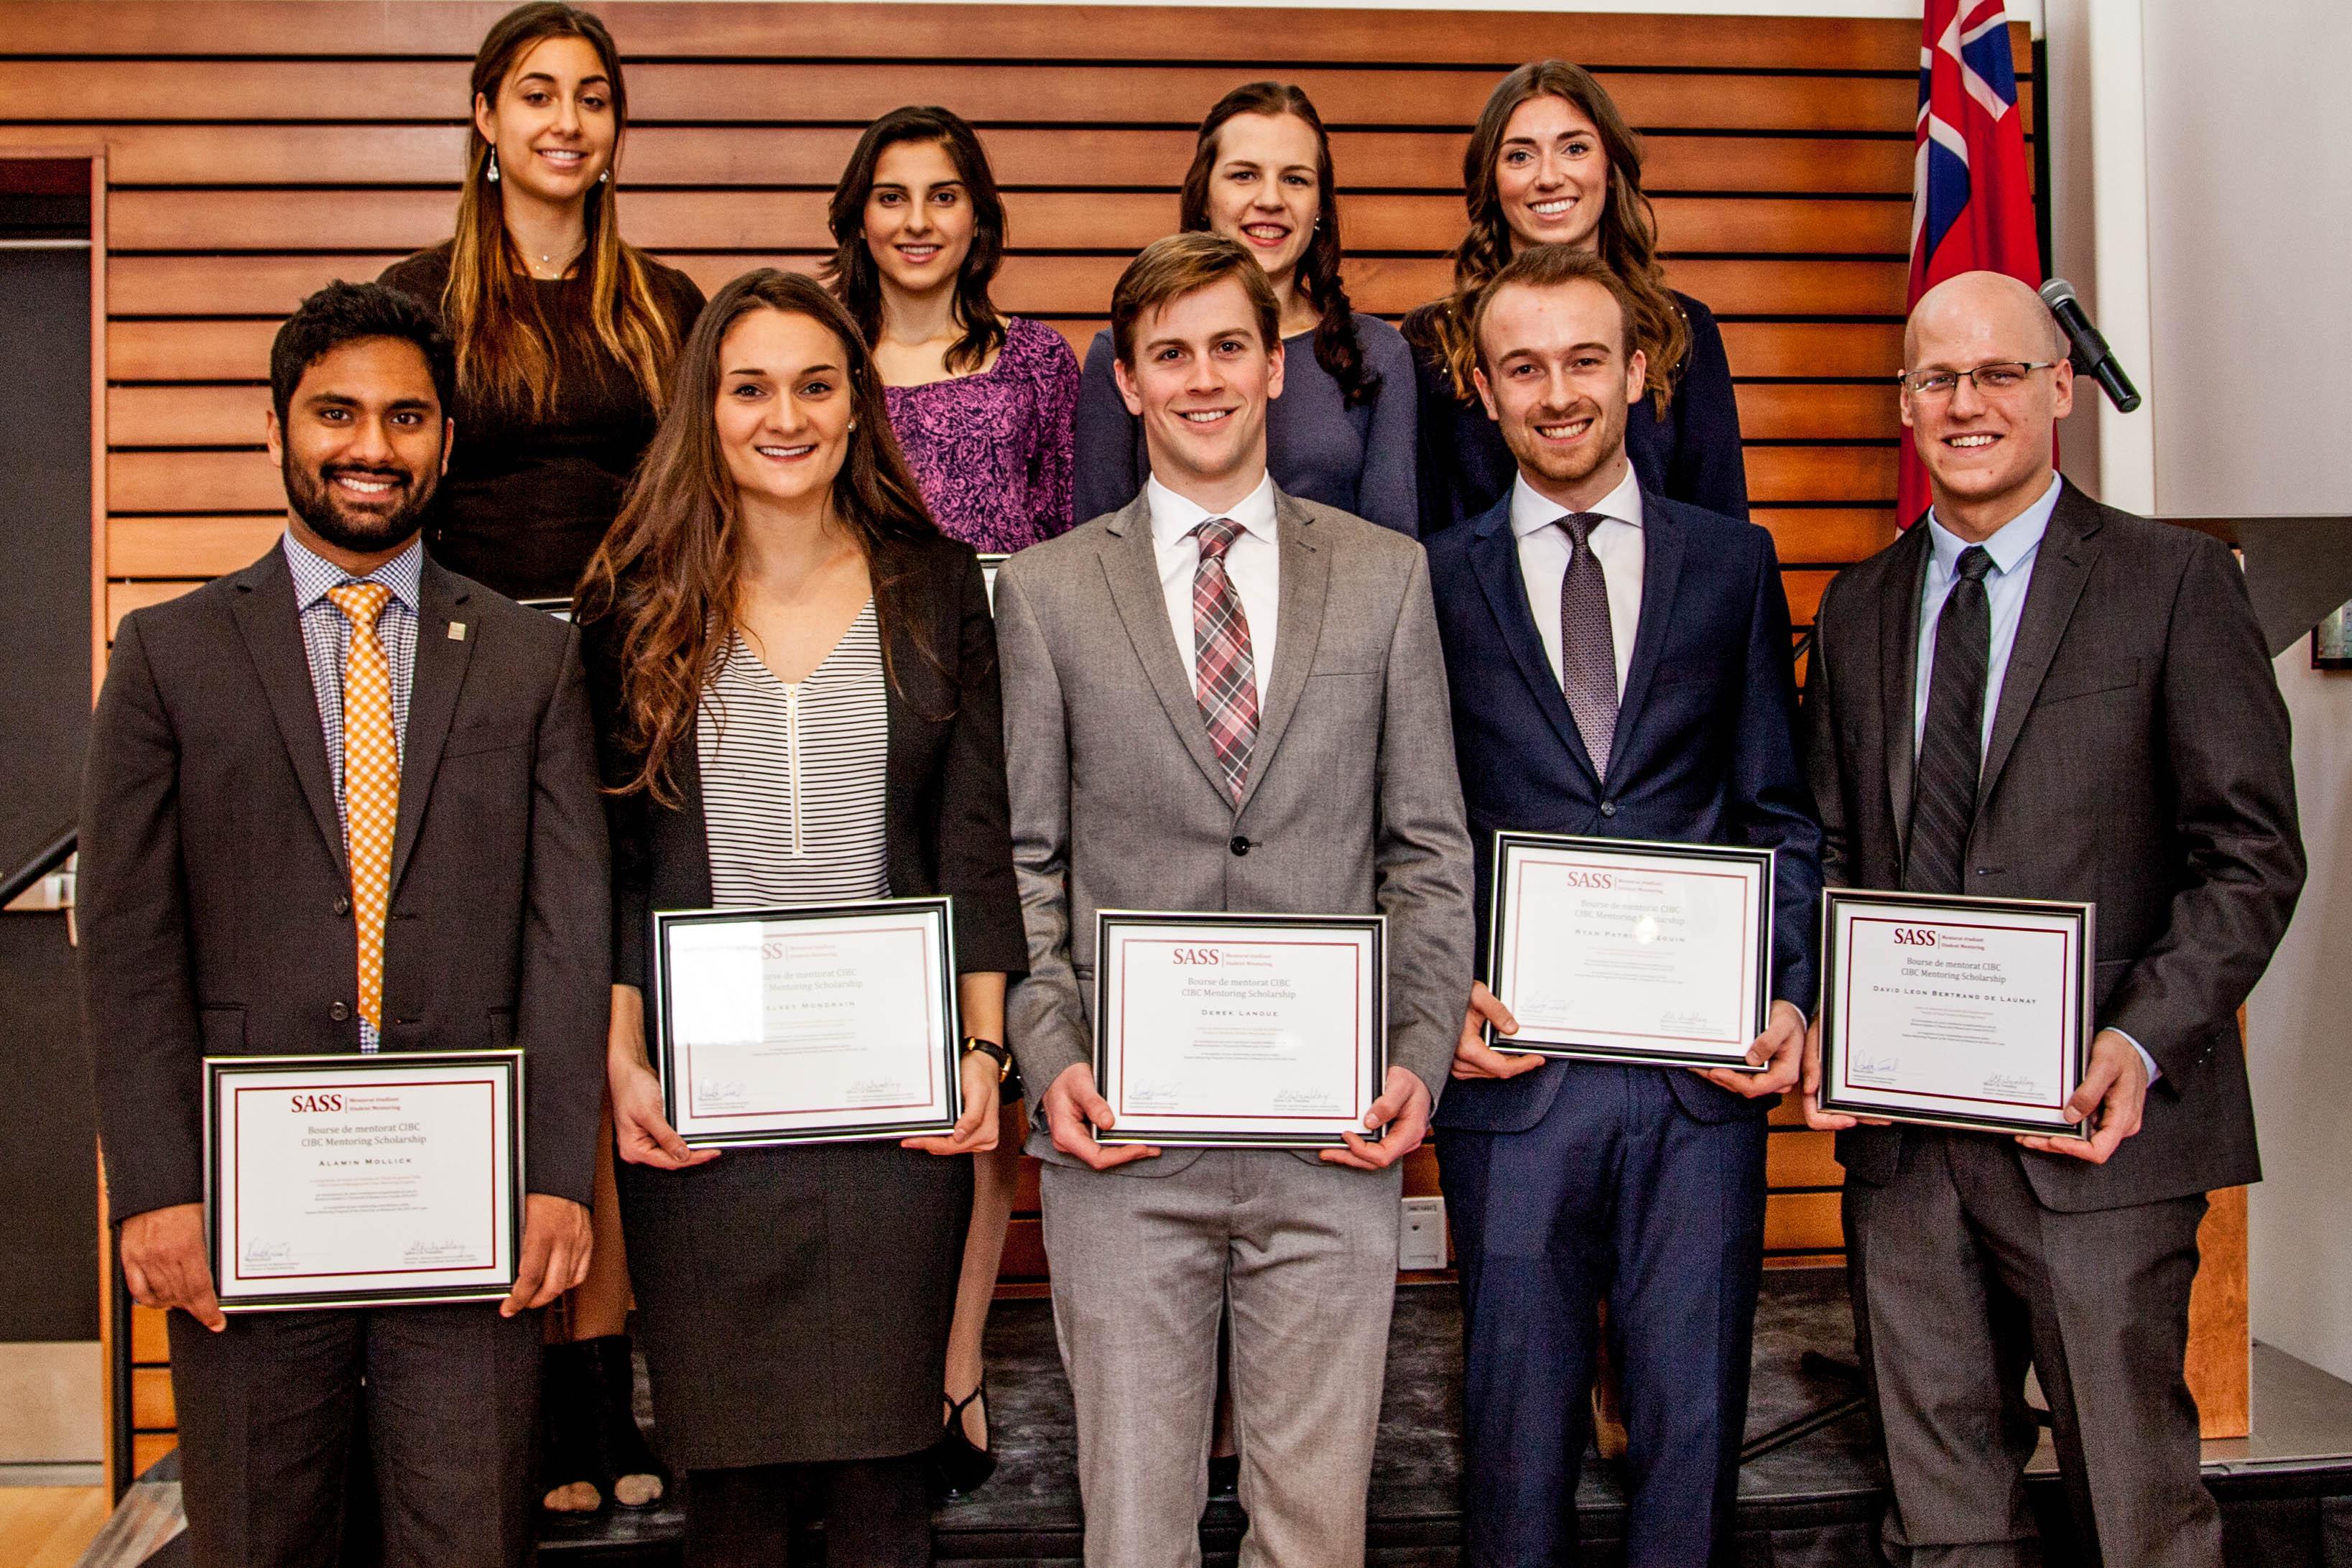 Récipiendaires de la bourse CIBC 2016-2017